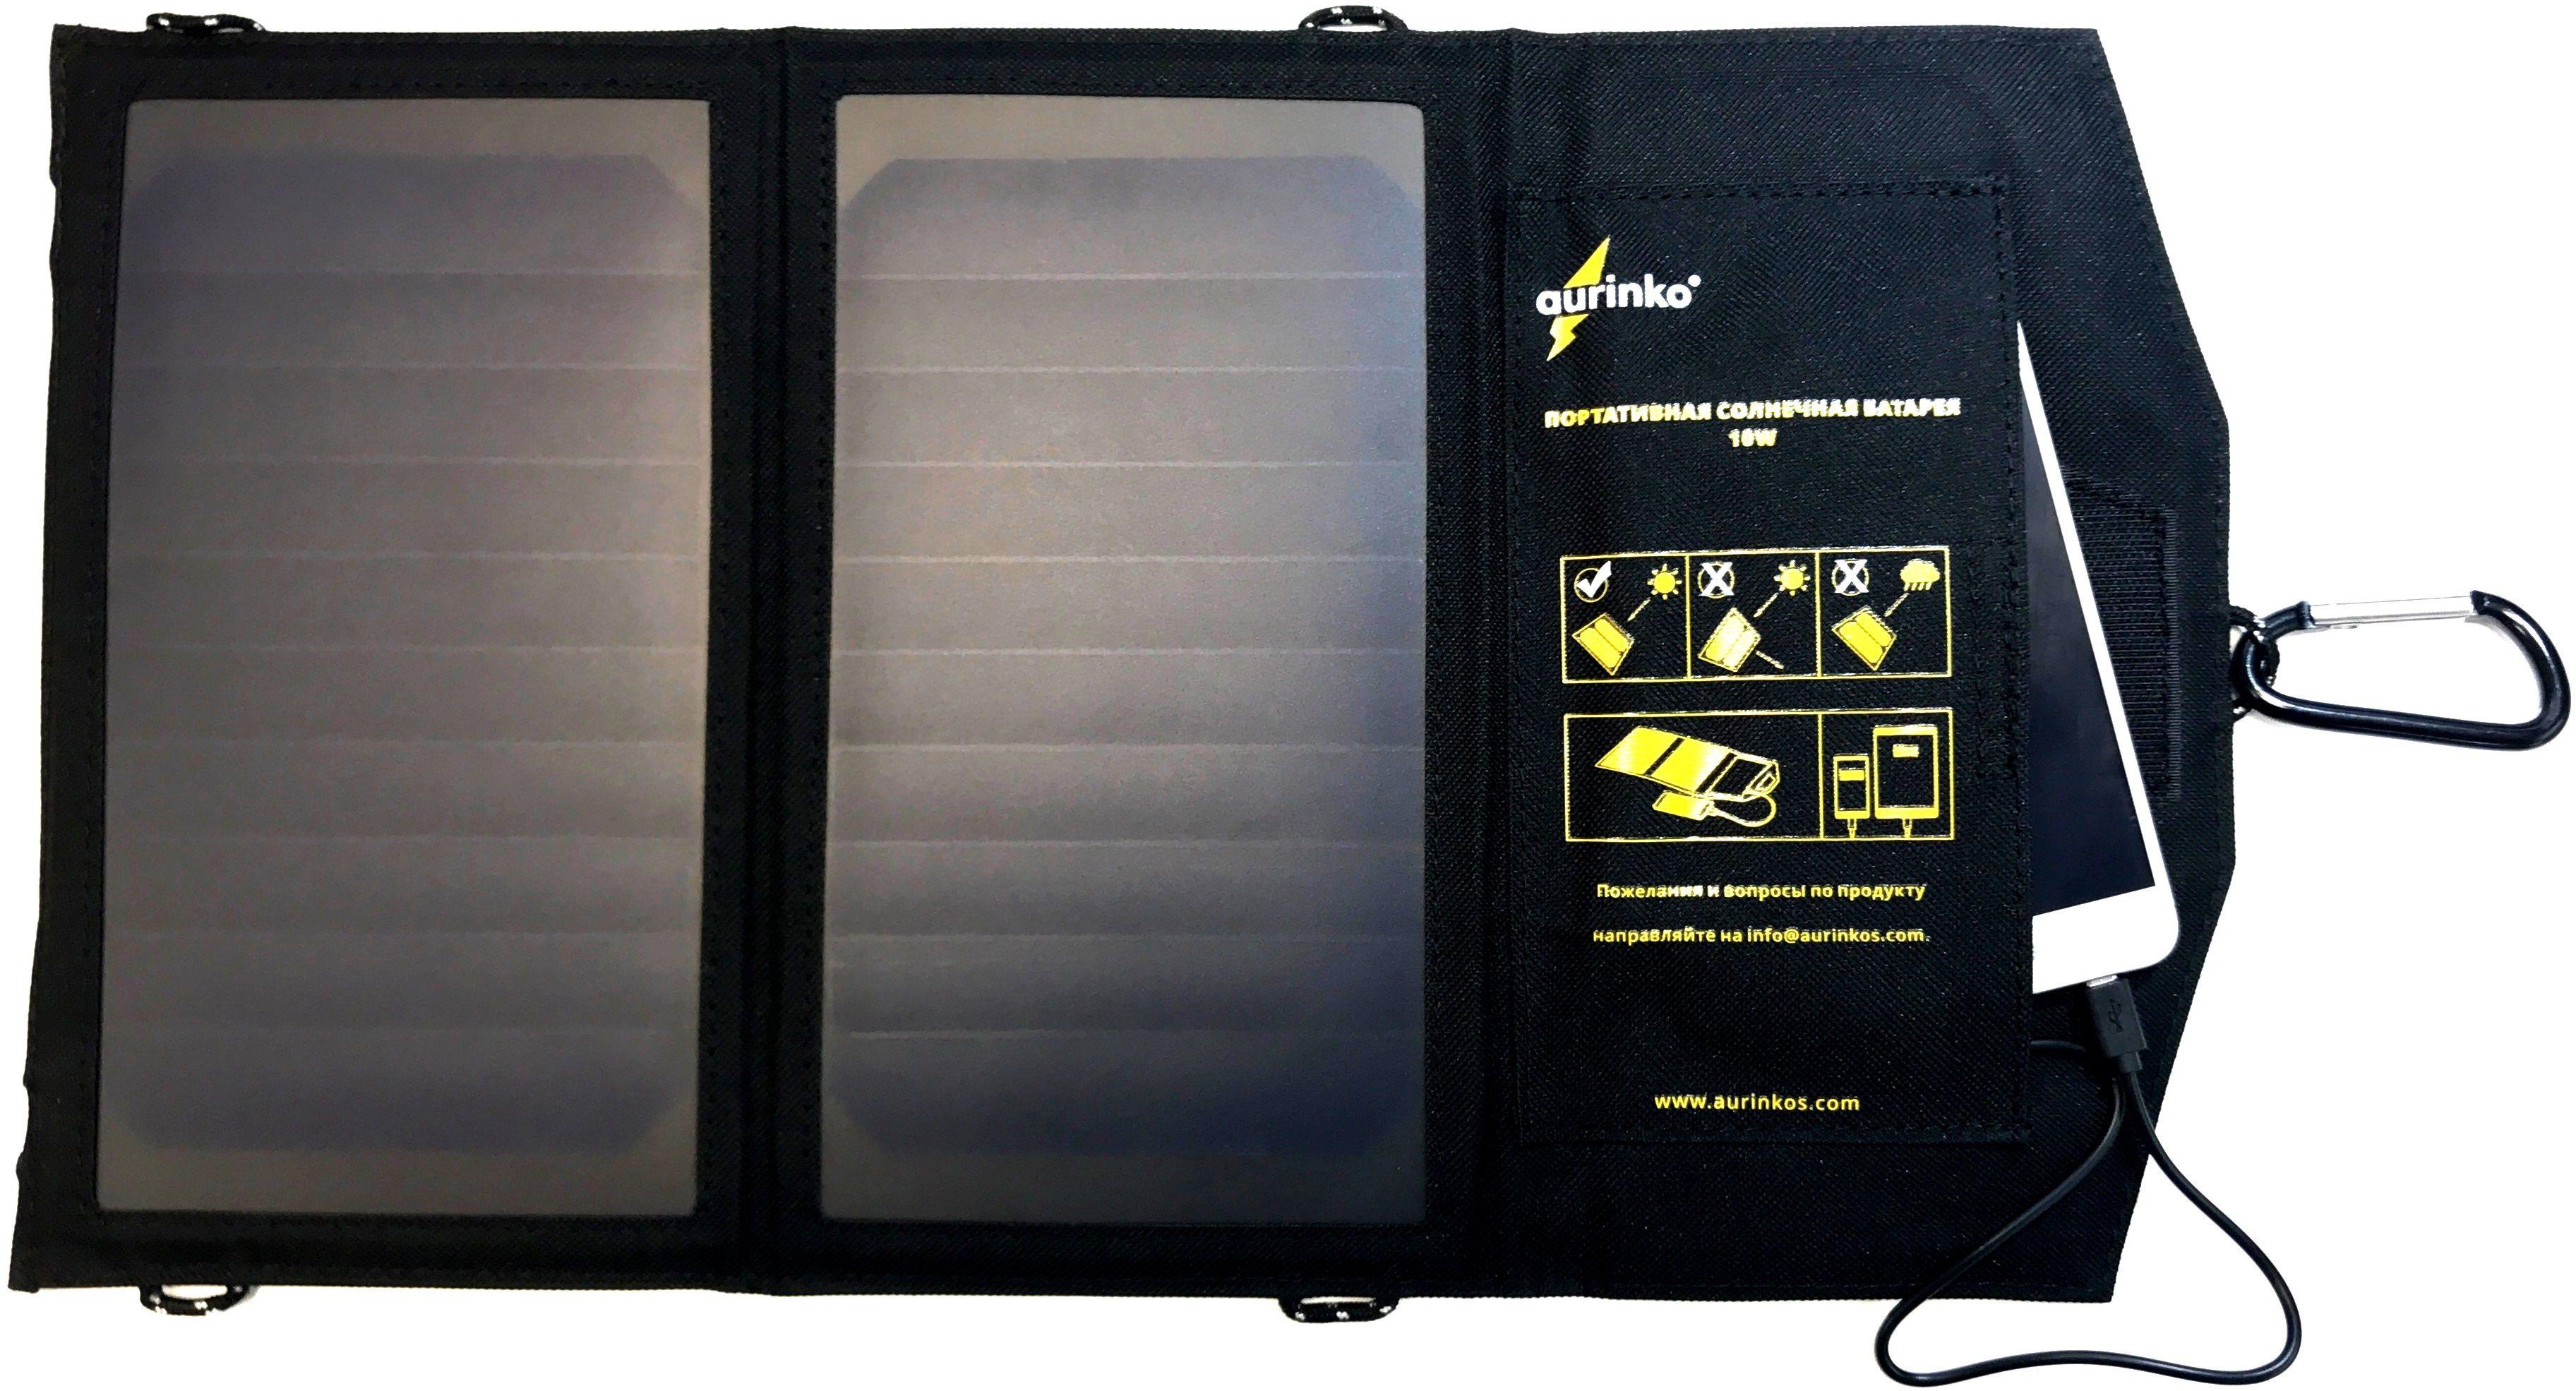 Портативная солнечная батарея Aurinko® ZigzaG 10W